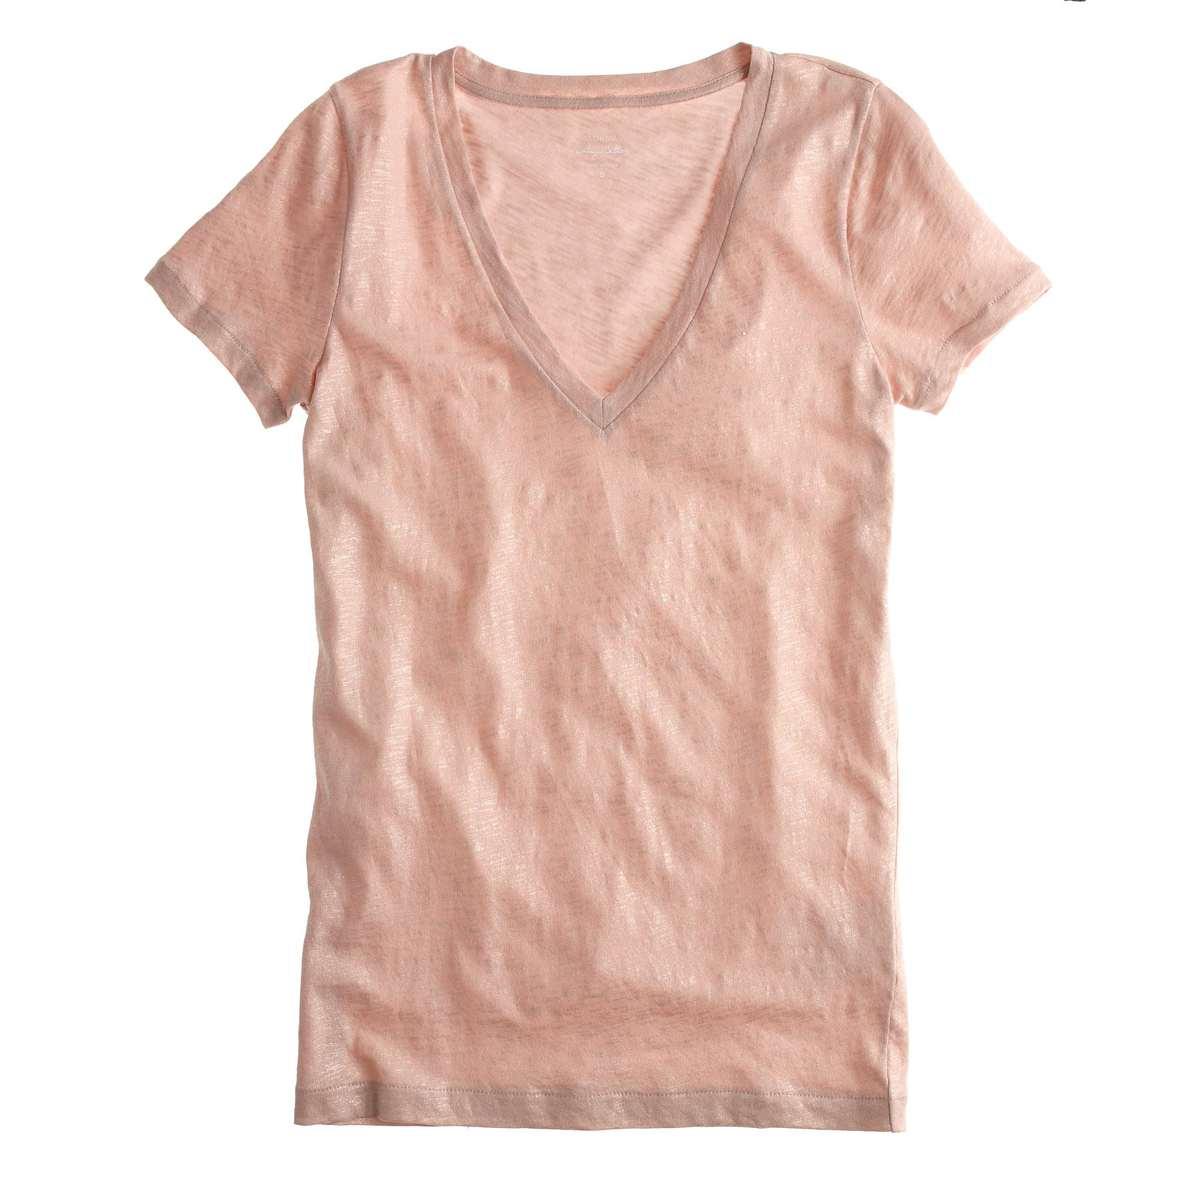 J. Crew Vintage cotton V-neck T-shirt in metallic - Wardrobe Oxygen